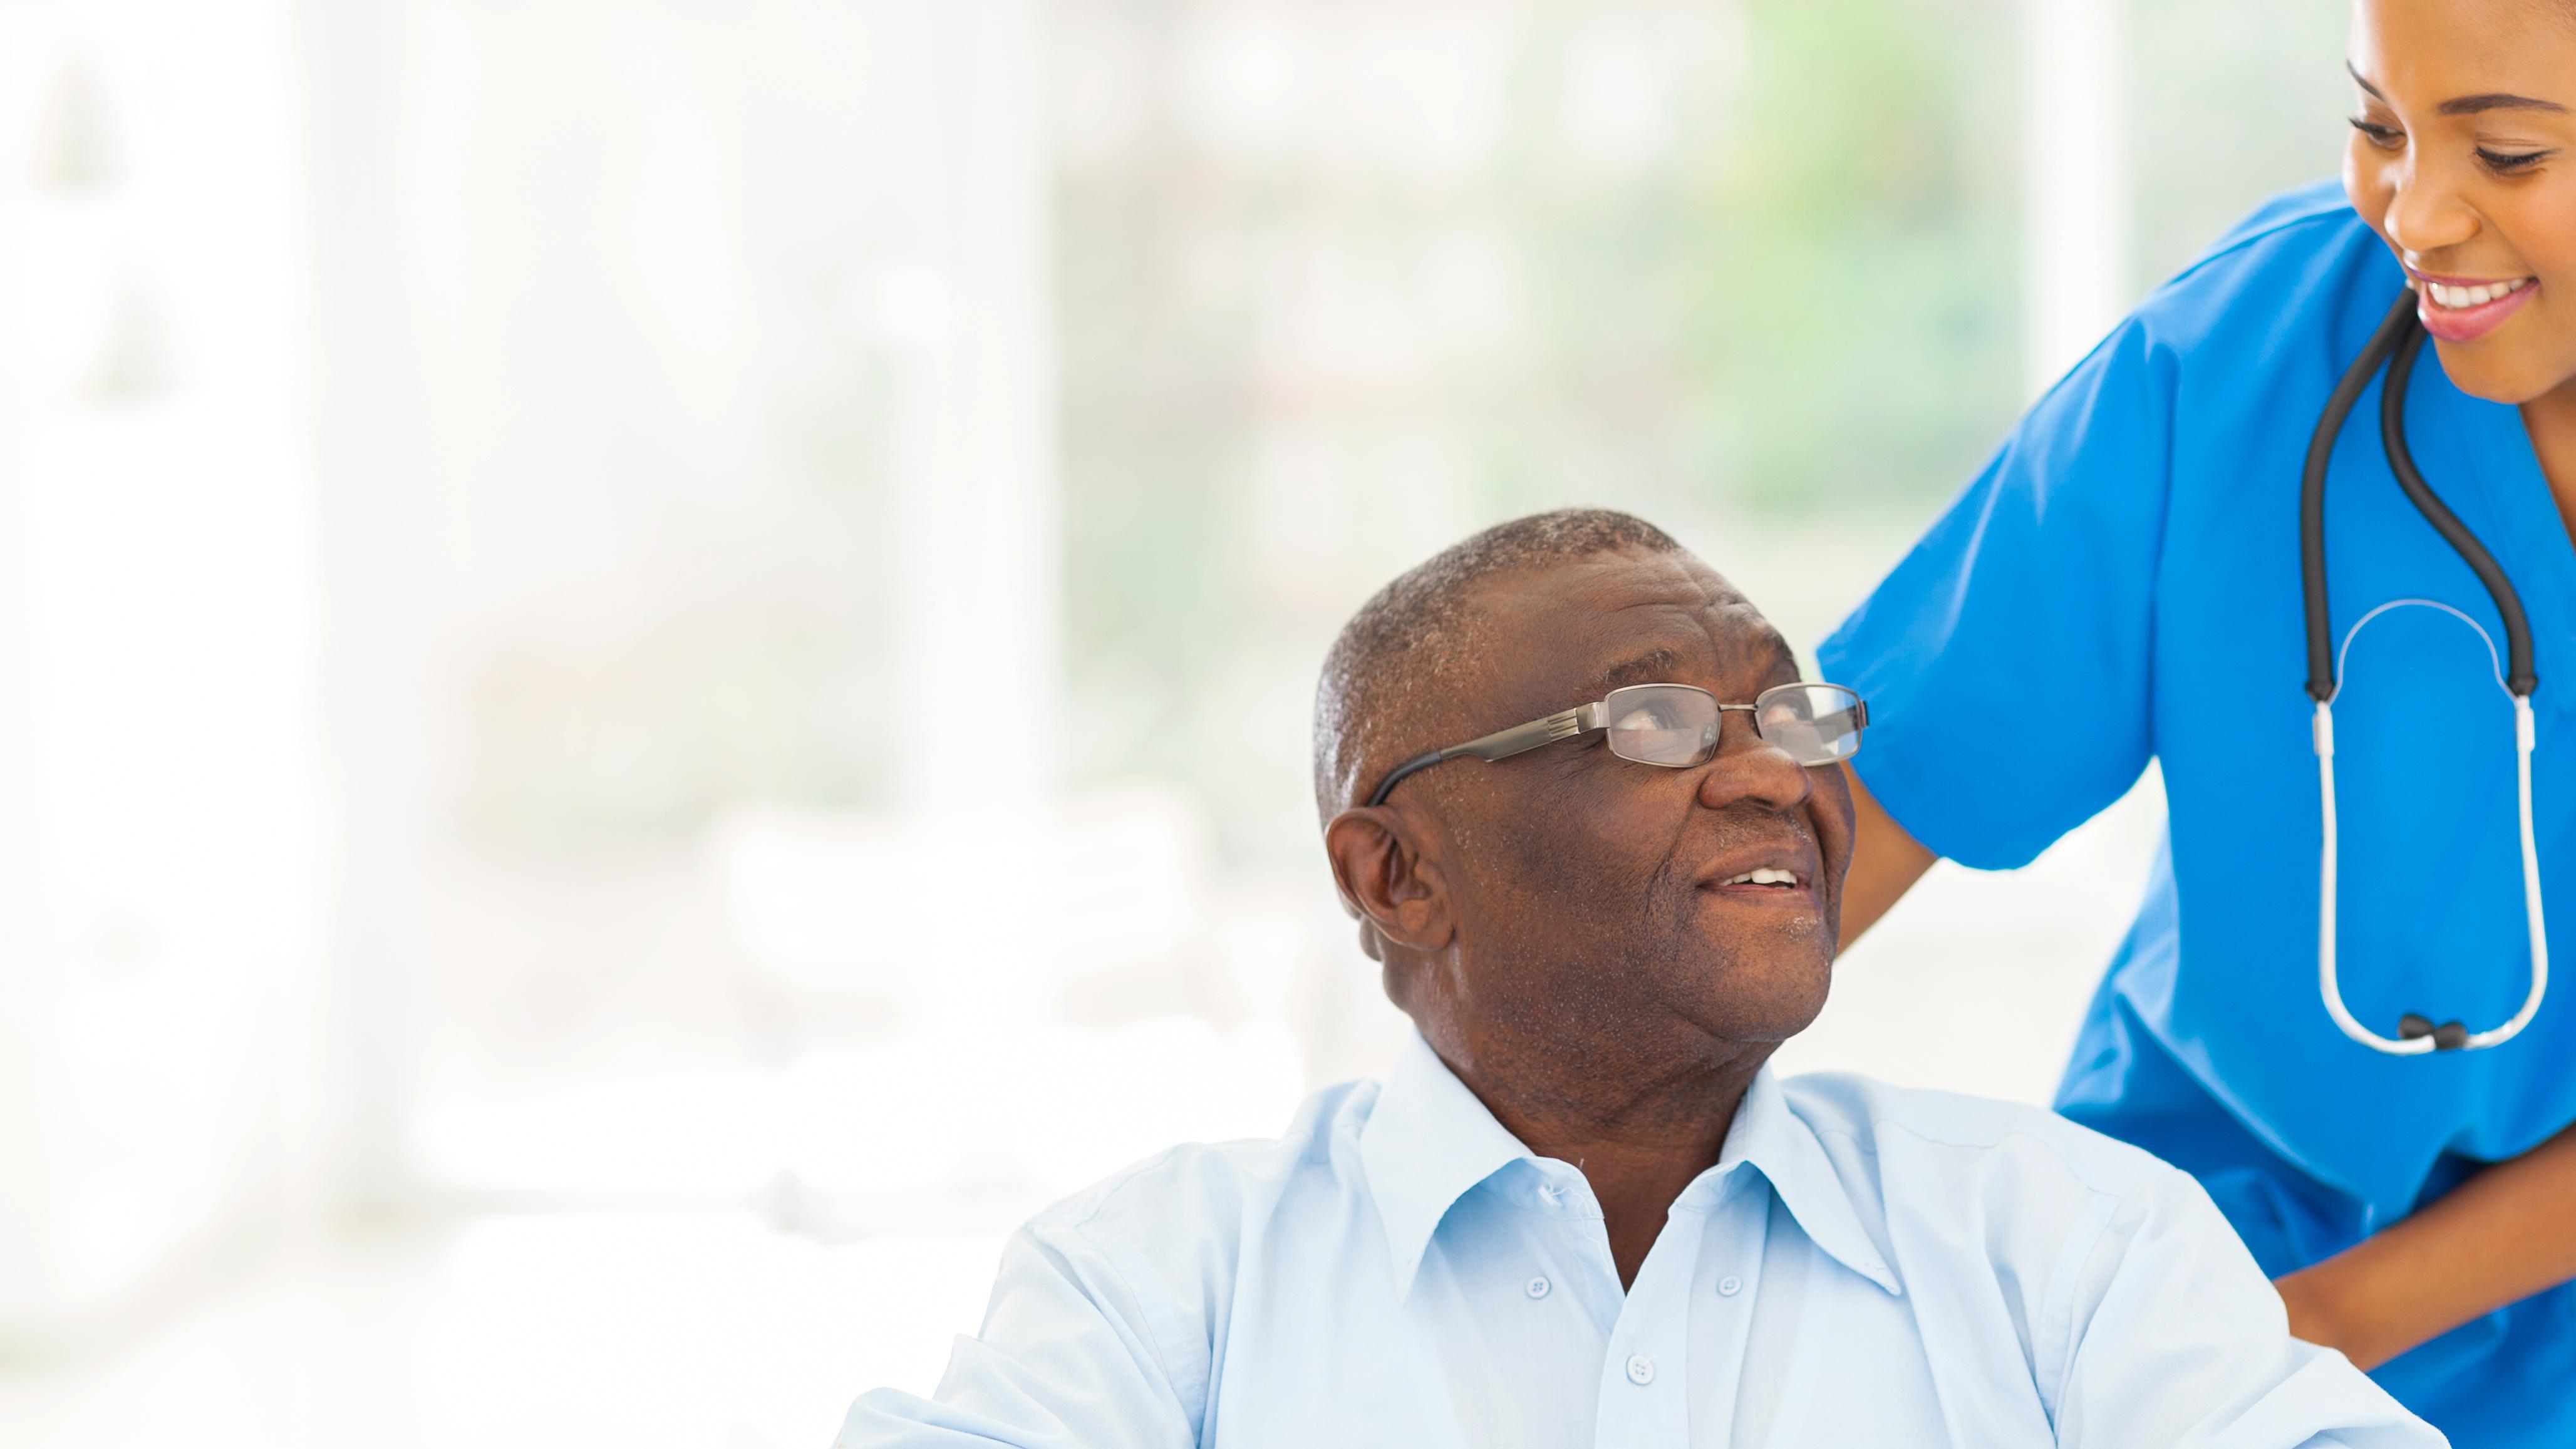 Black female nurse smiling at elderly black man in a wheelchair